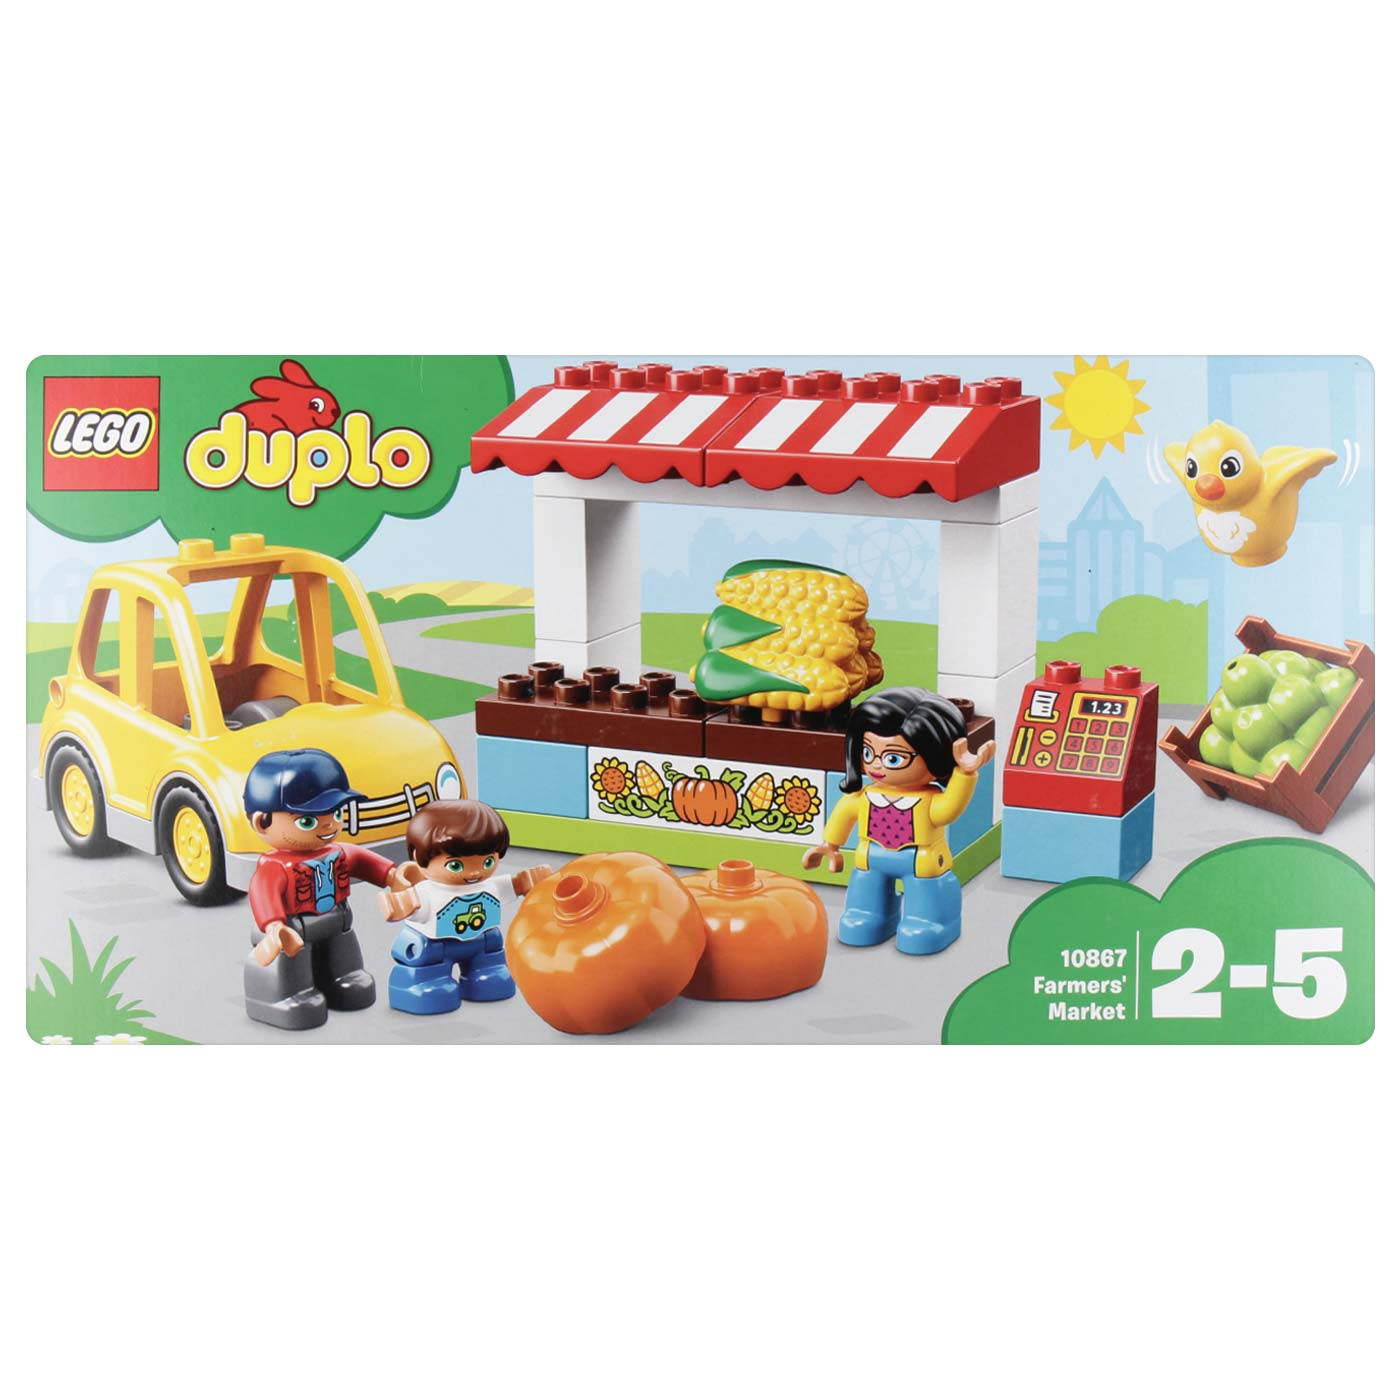 Lego Duplo Town Farmers' Market